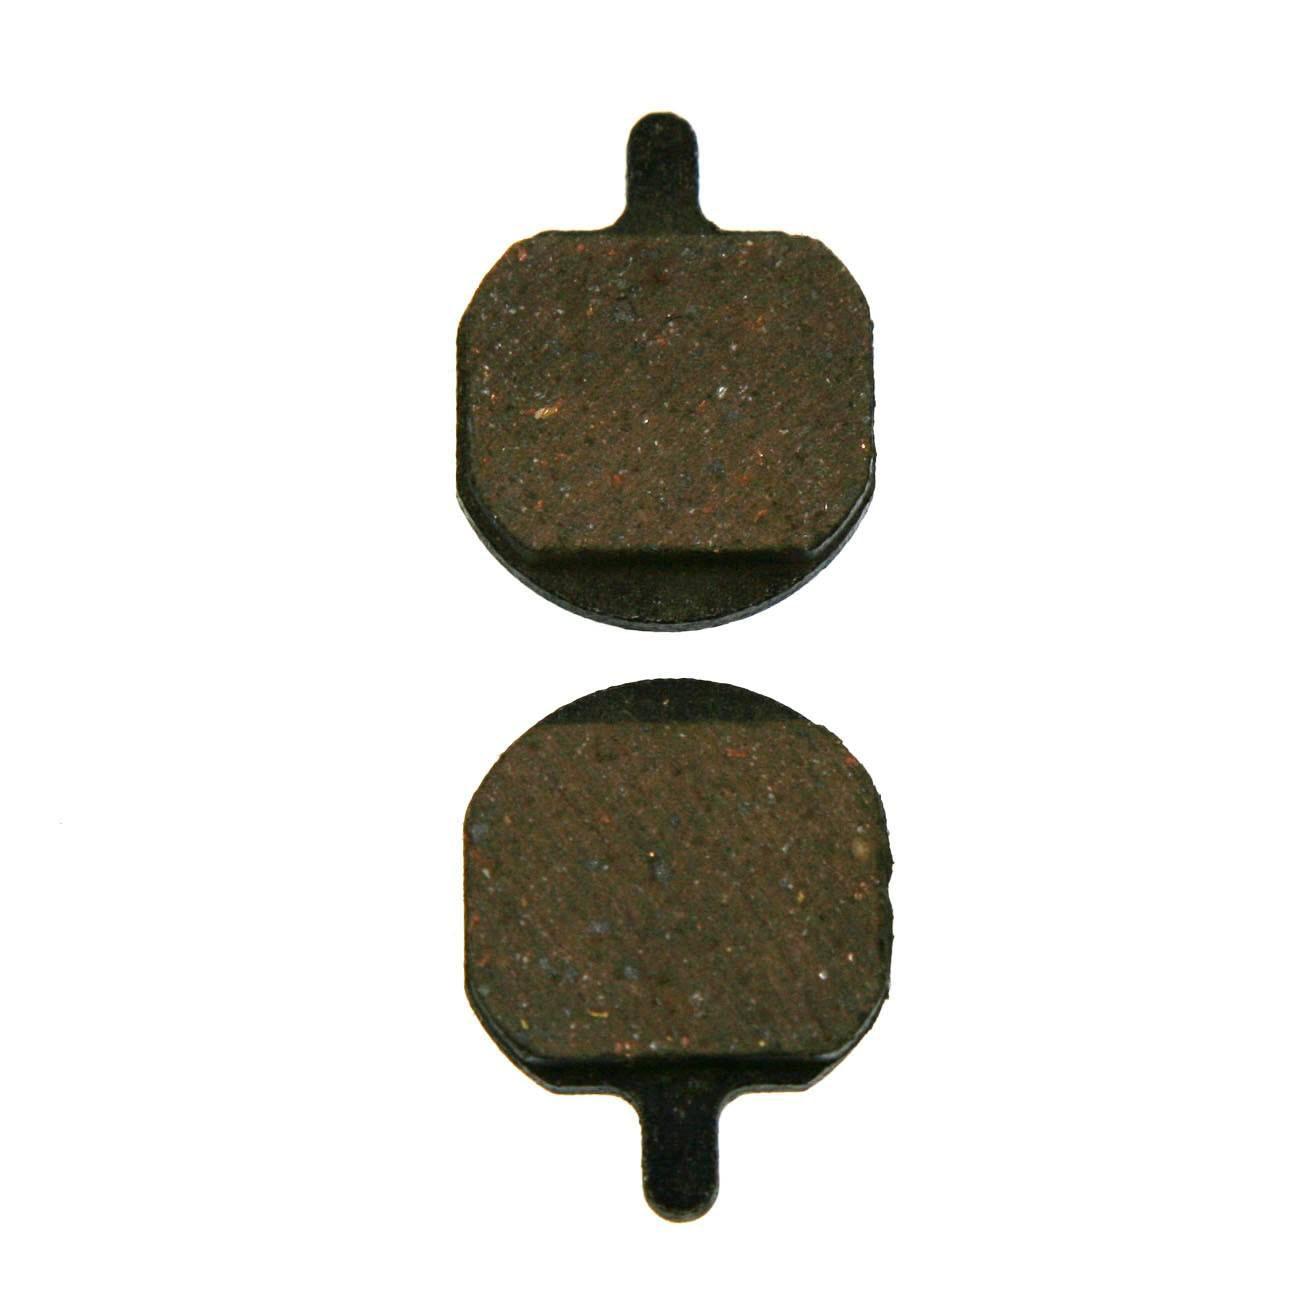 DISC BRAKE PADS FOR HAYES GX-2//MX-2//KX-3 MESH SOLE HYD JAK-5 MTB BIKE